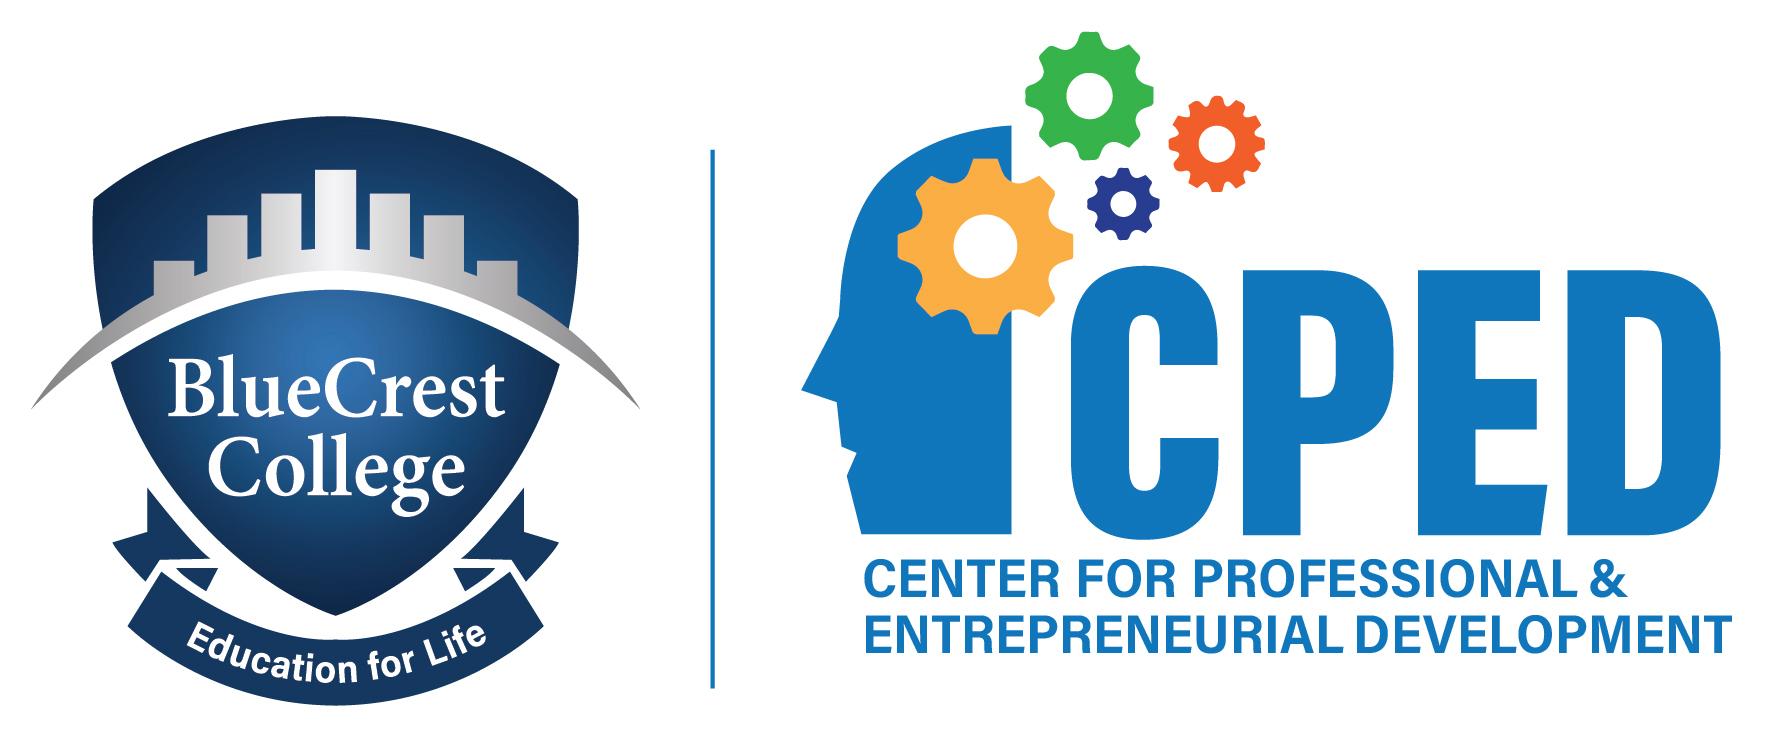 CPED @ BlueCrest University College